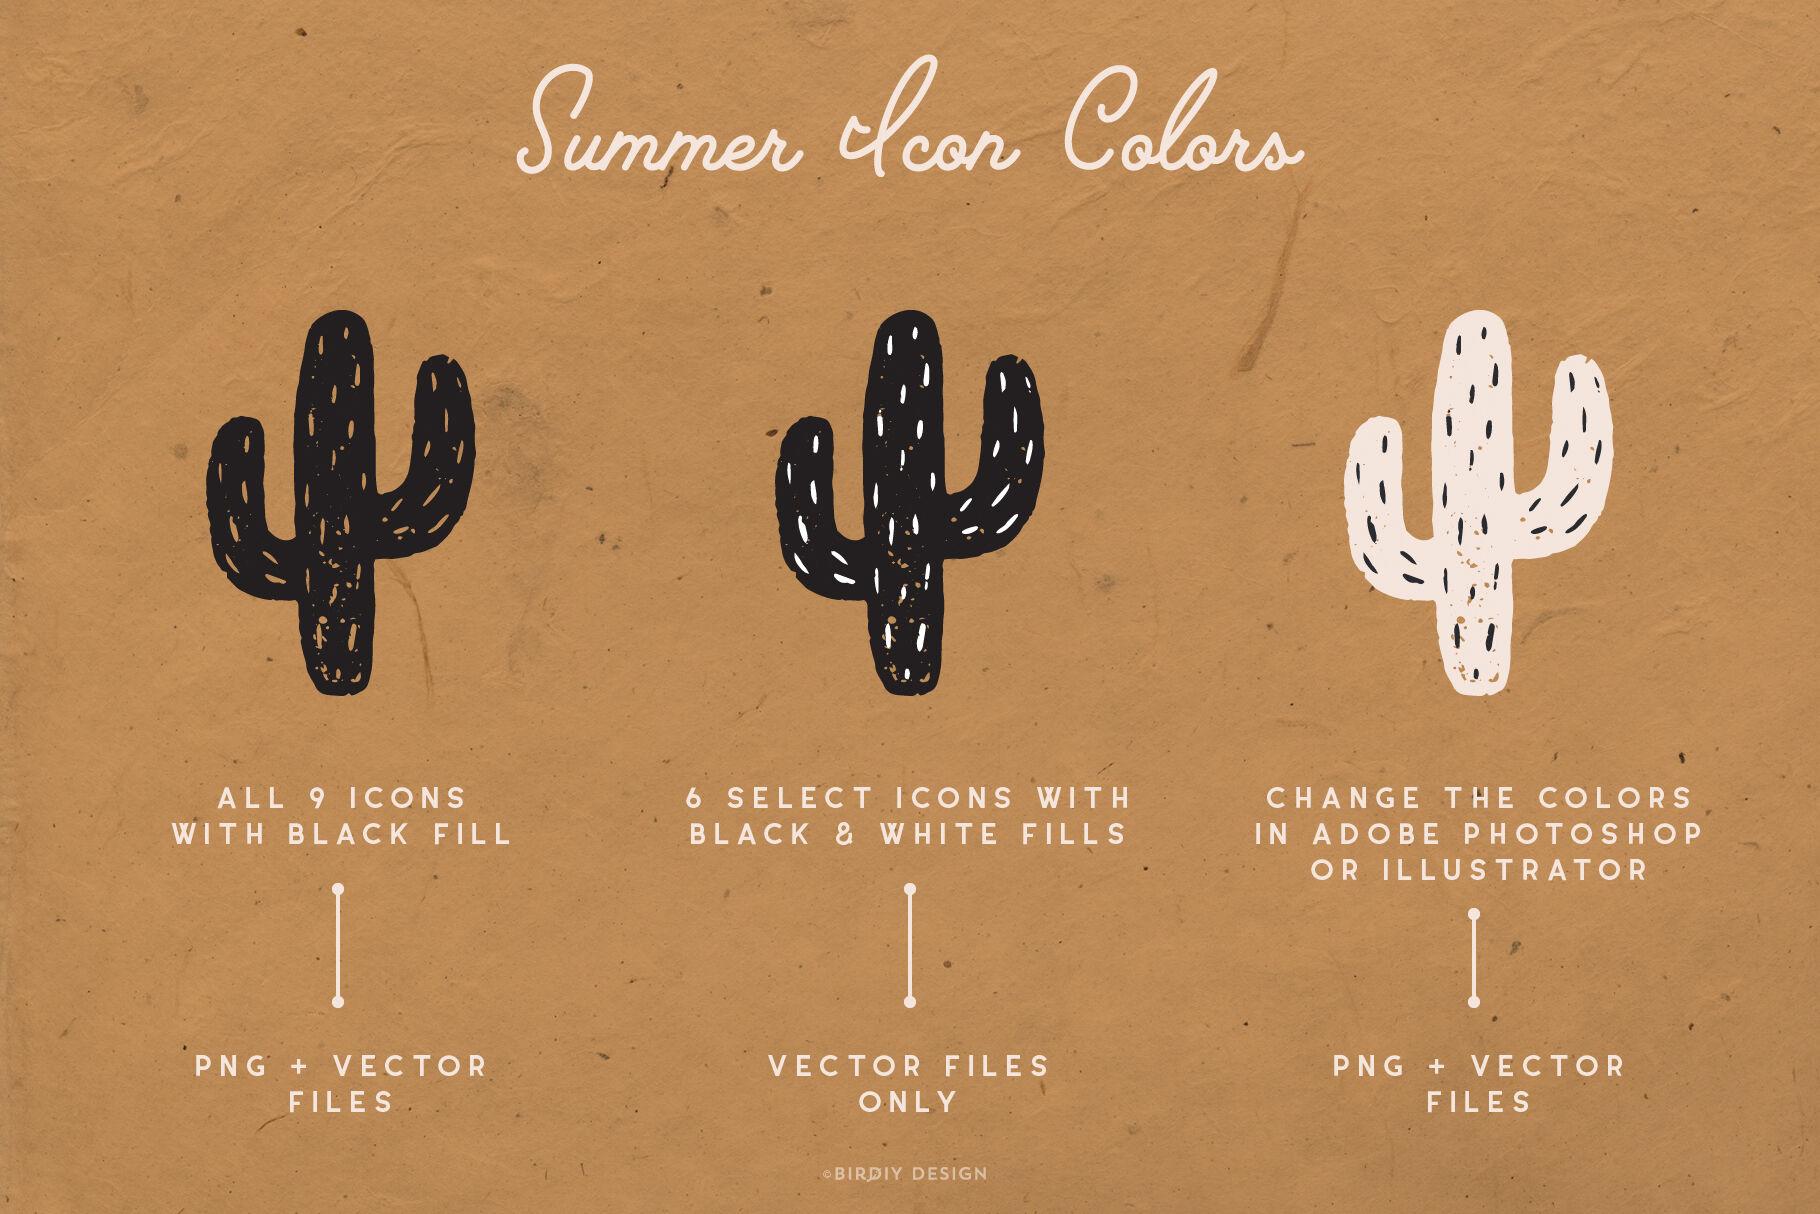 Summer Icons Hand Drawn Graphics Set By Birdiy Design